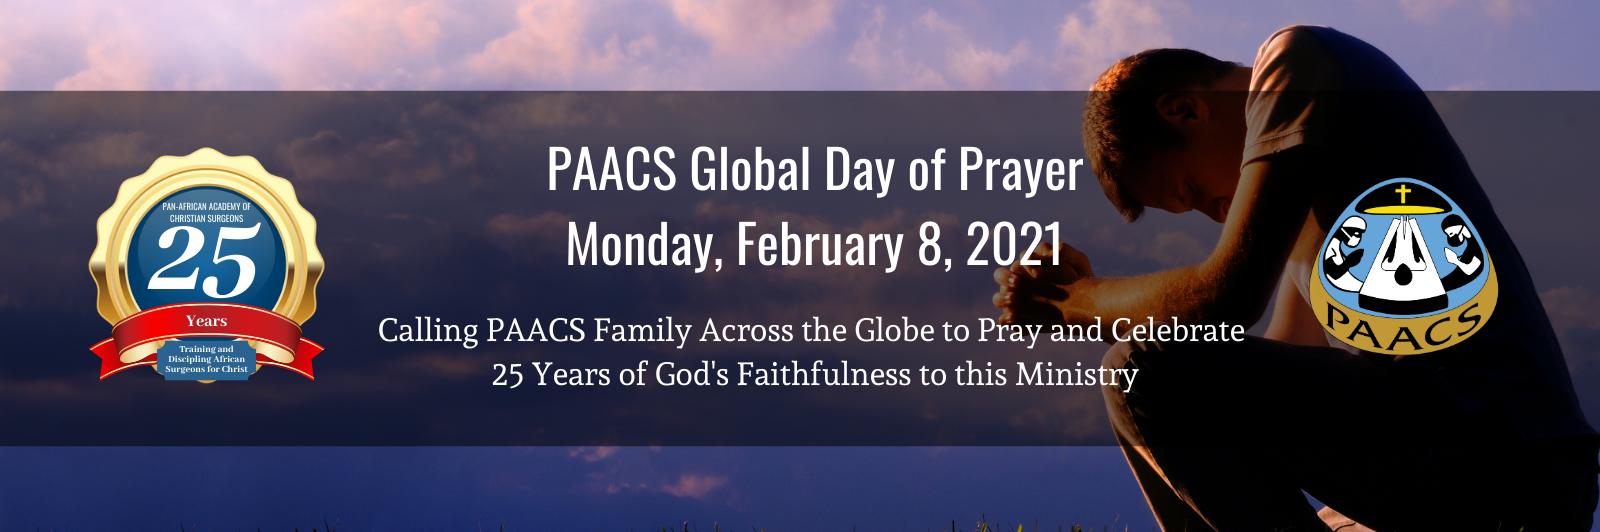 PAACS Global Day of Prayer